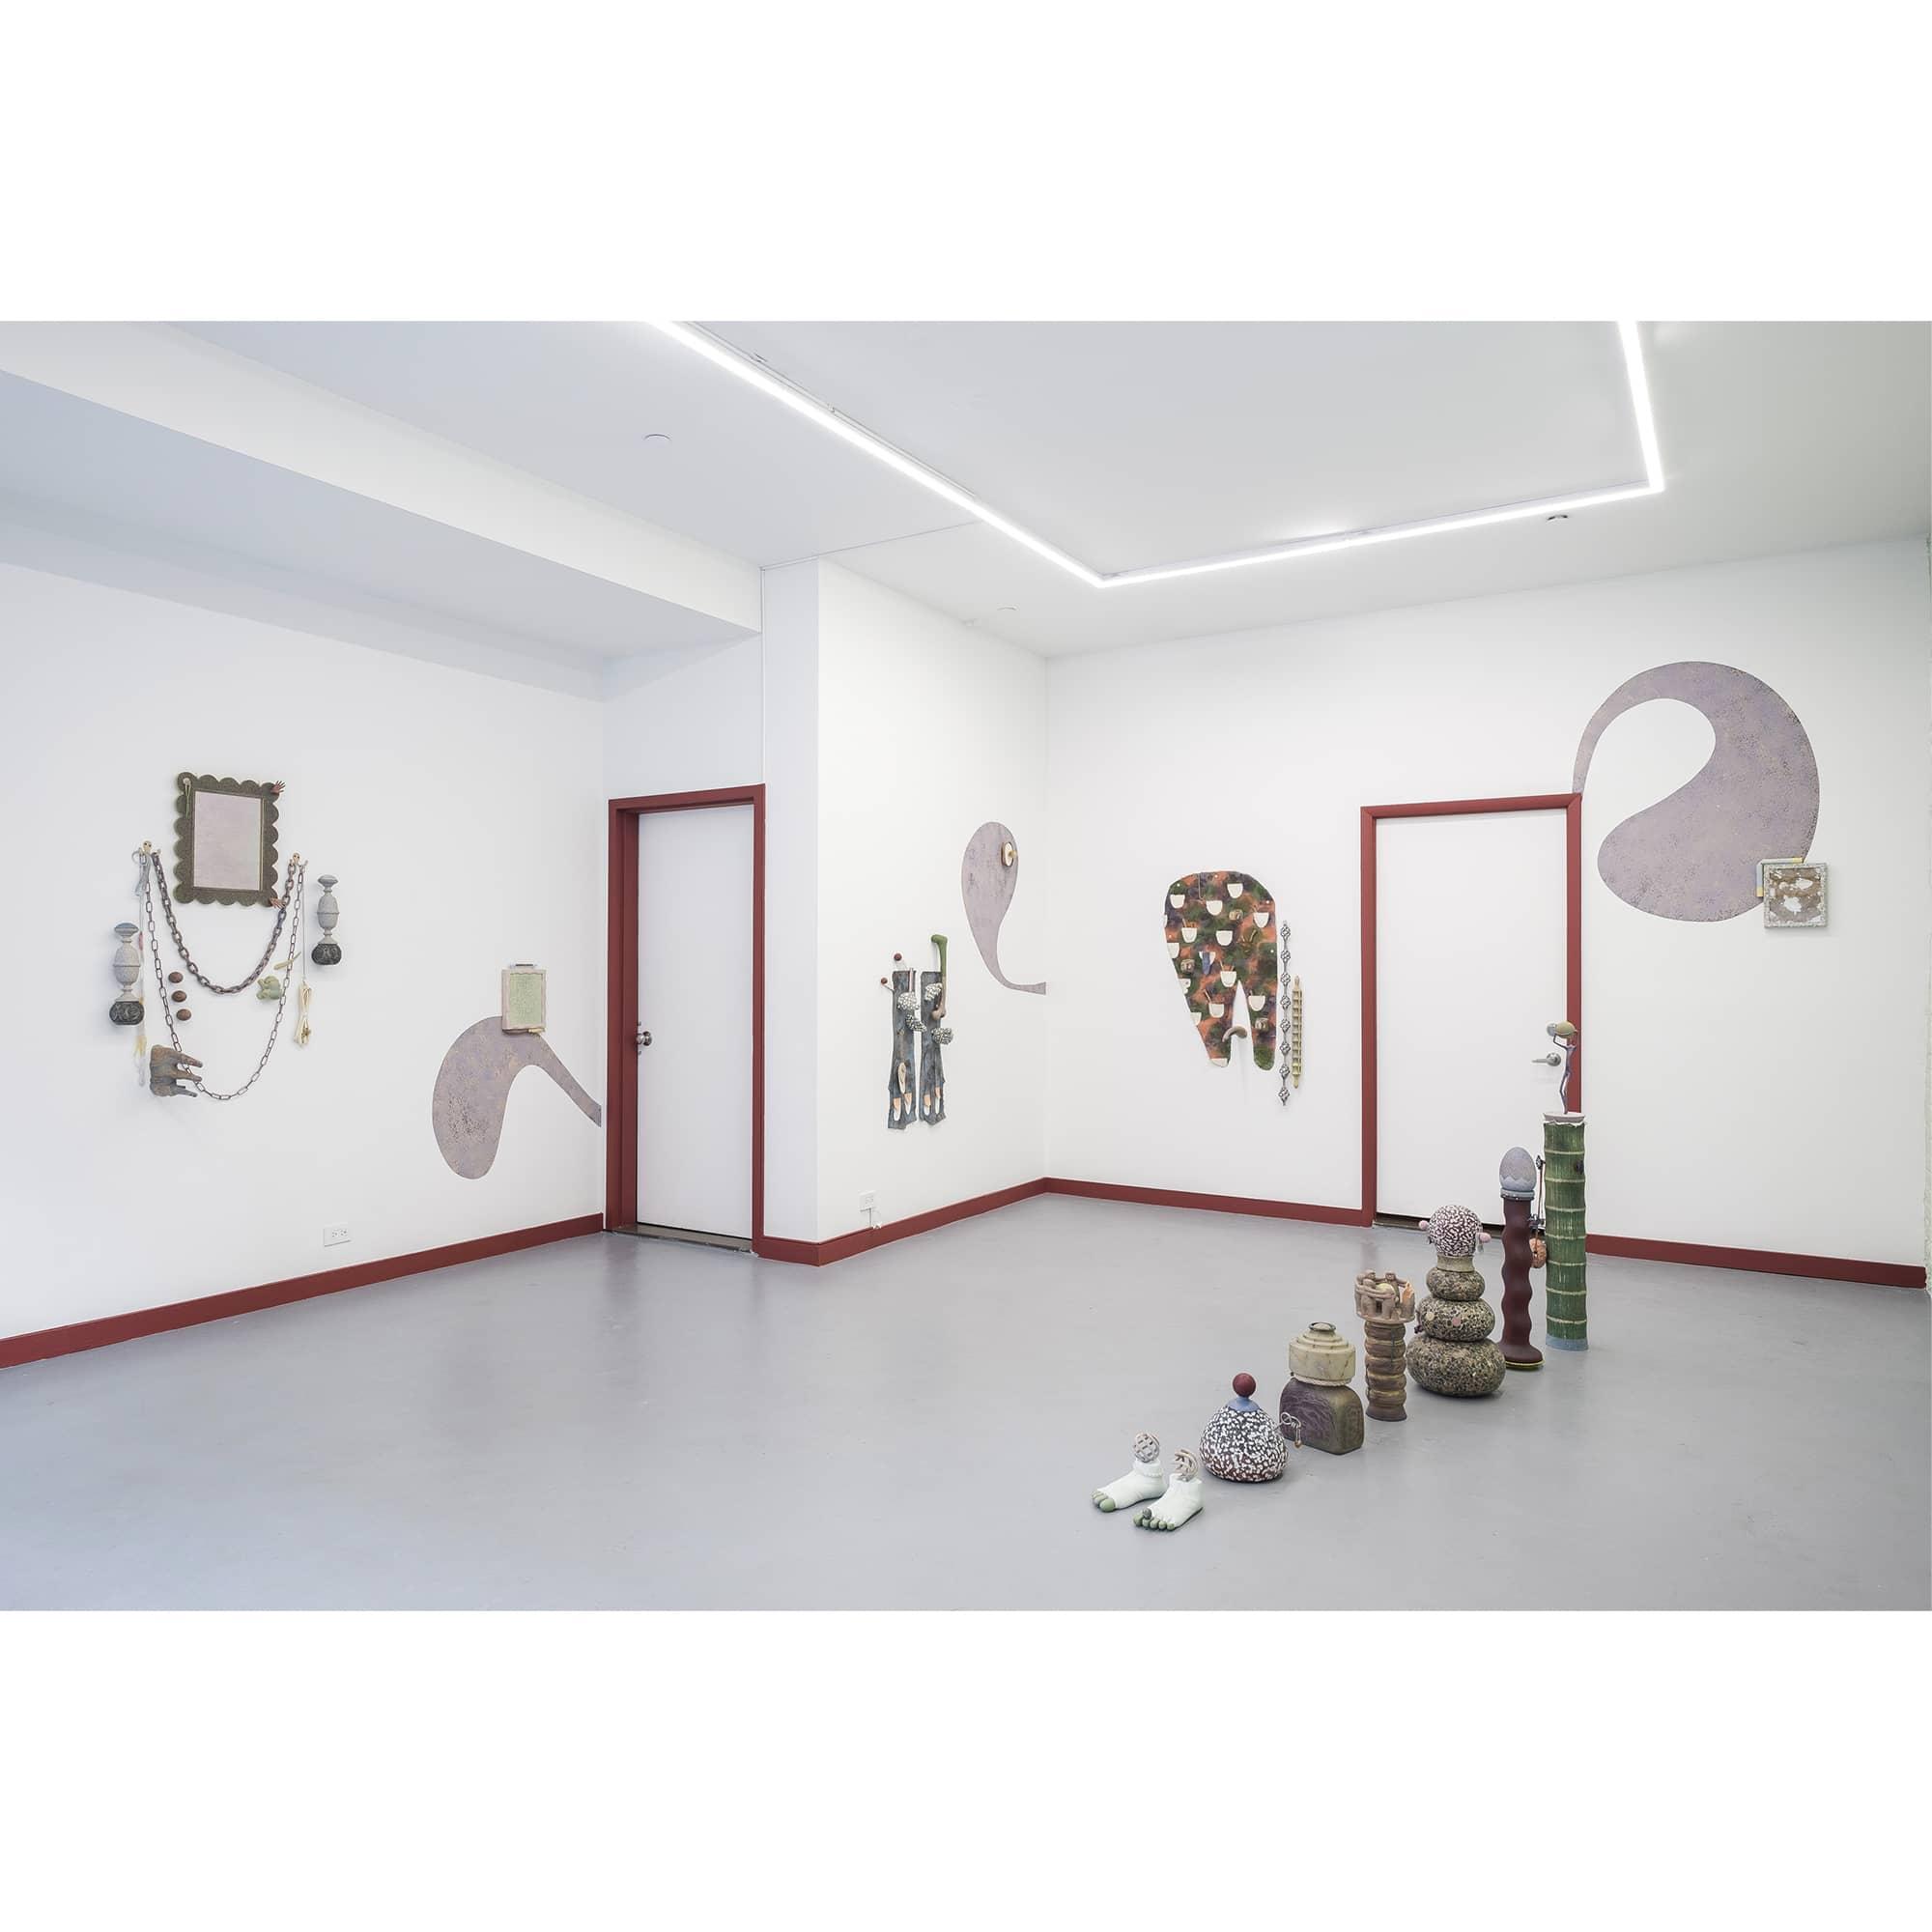 Talon Rouge: Six Mexican Artists Revisit José Juan Tablada and His New York Circle